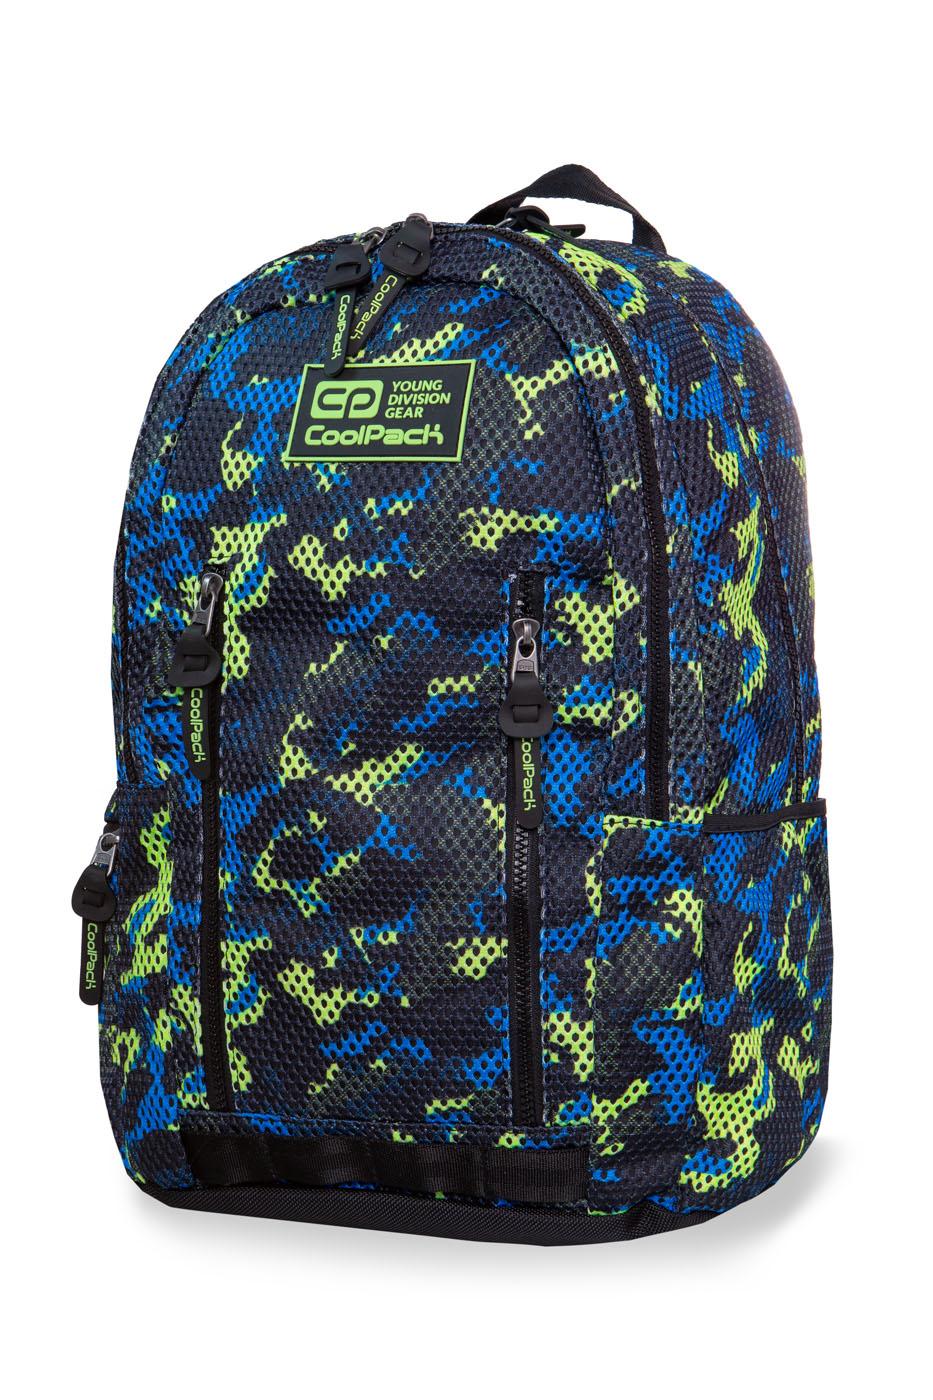 Coolpack - impact ii - youth backpack - camo mesh yellow